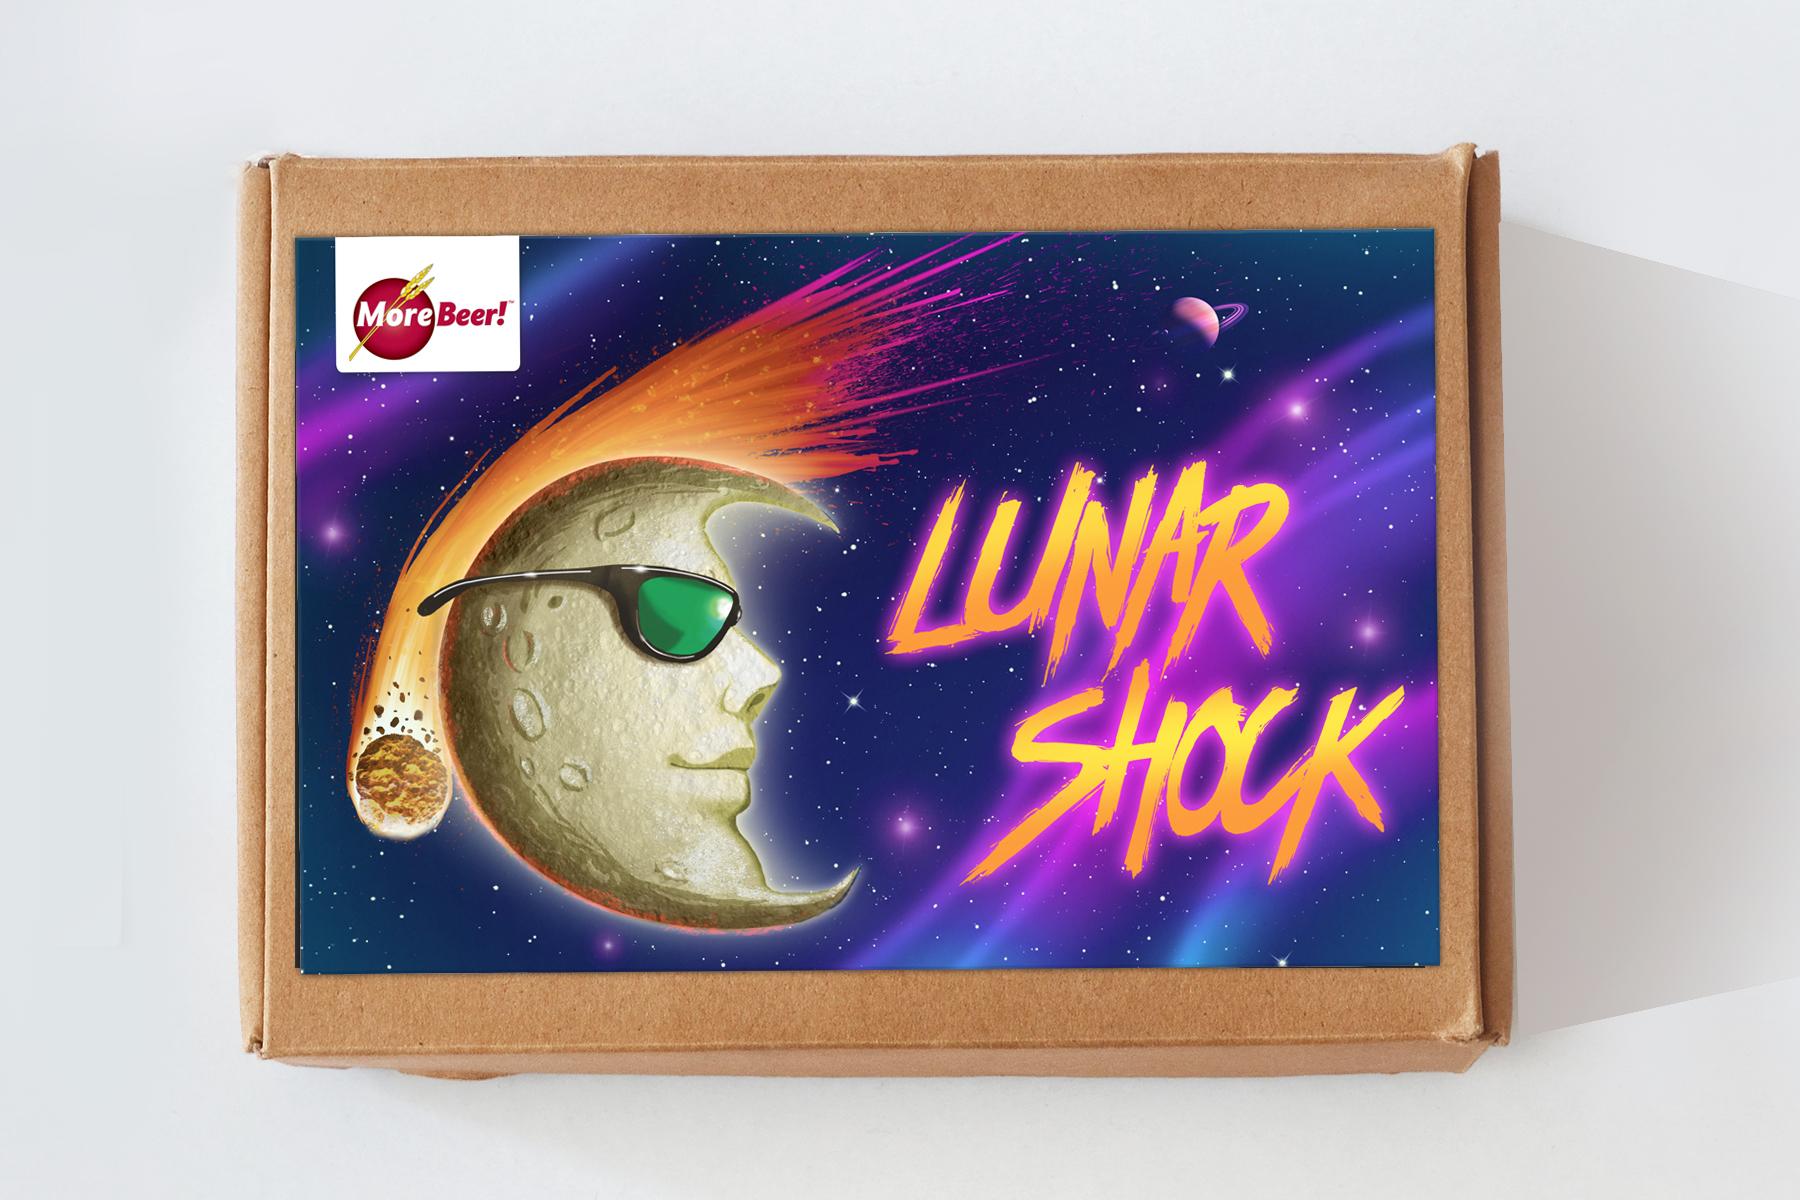 LunarShock.jpg